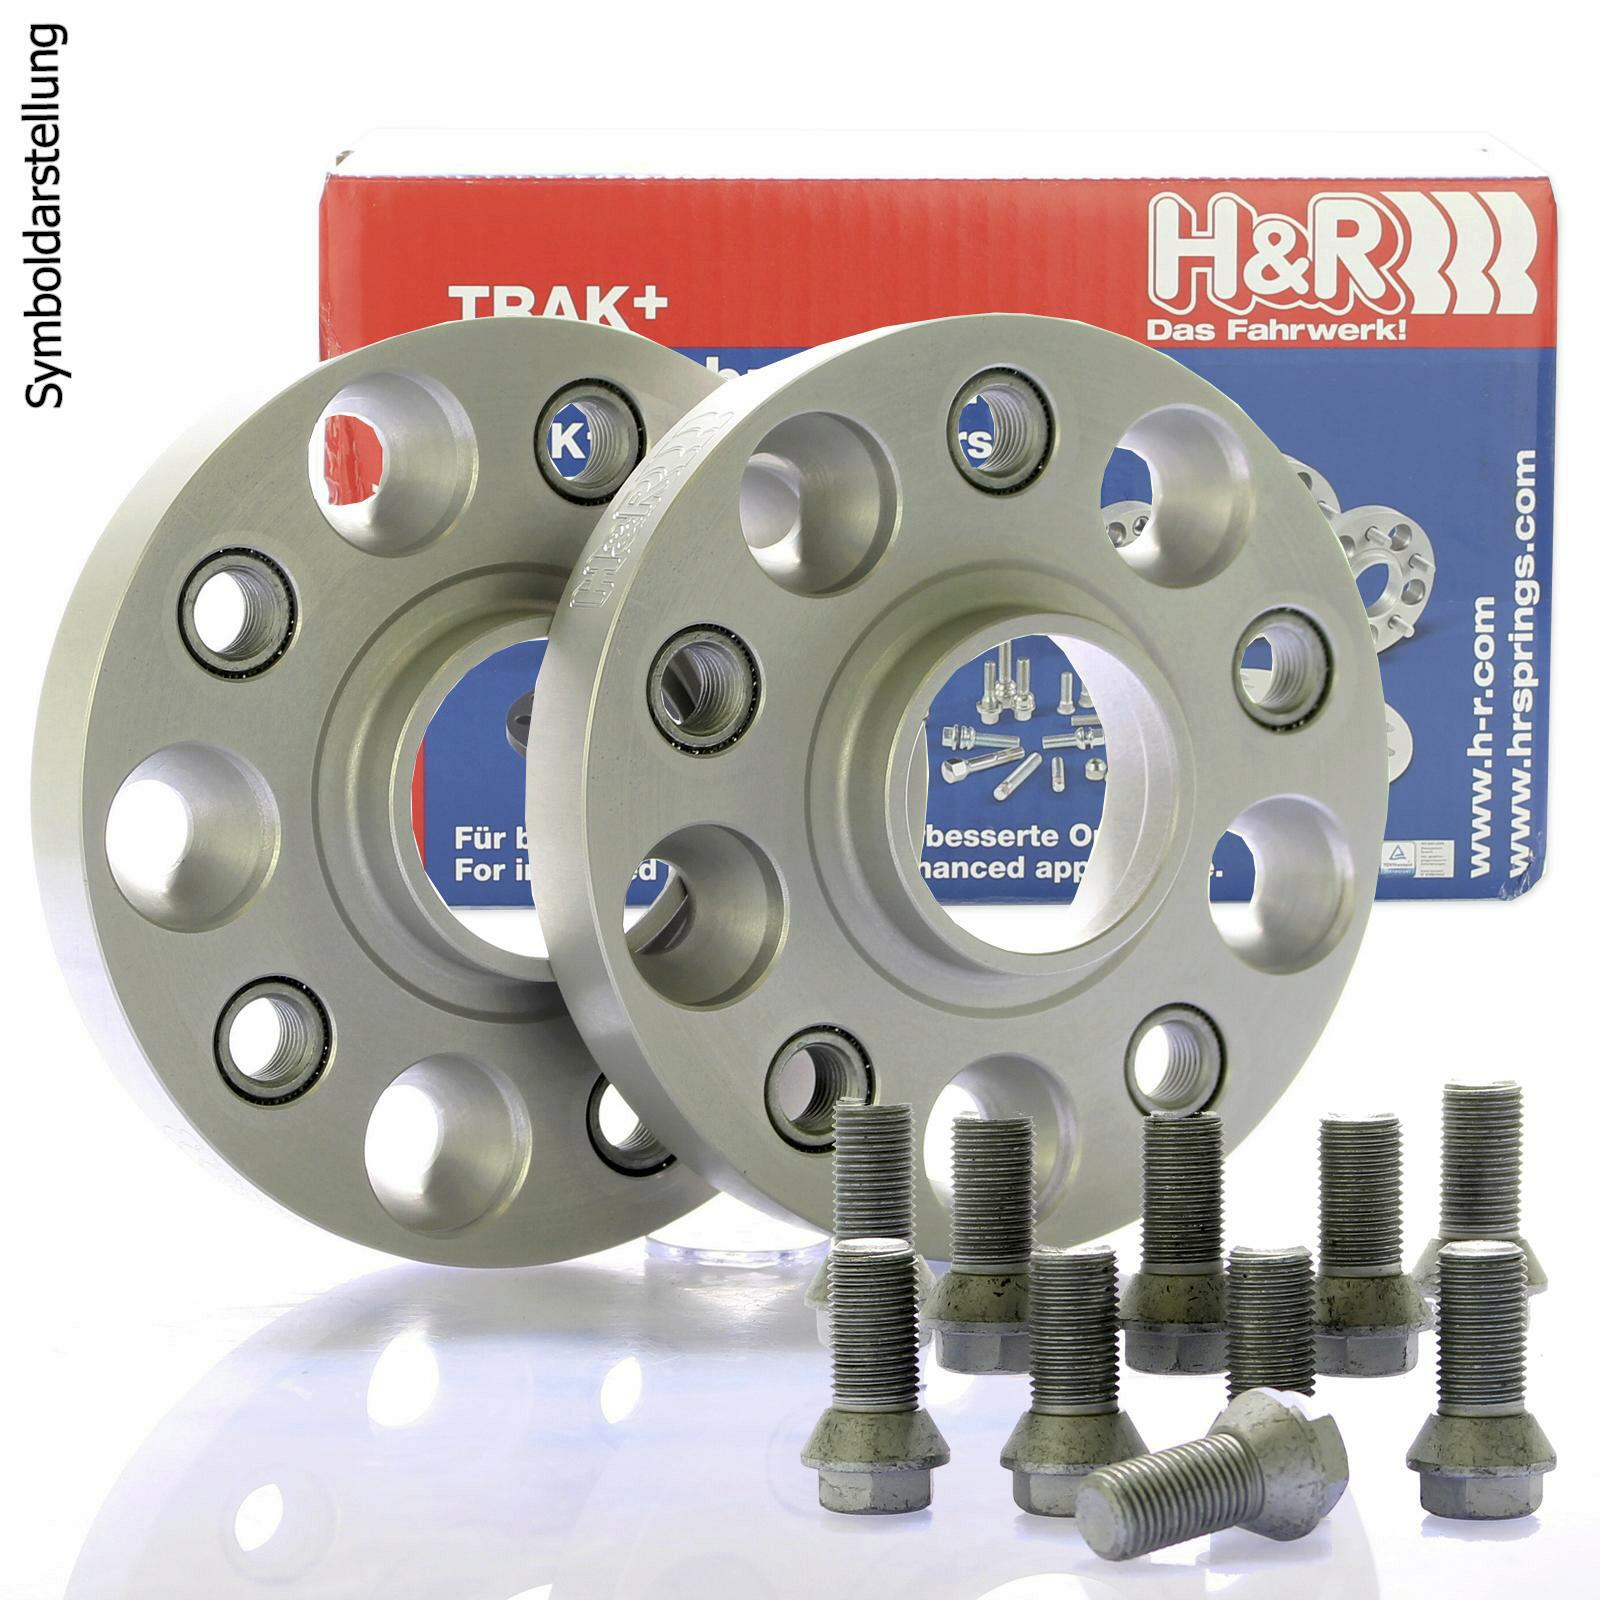 H&R DRA Spurplatten Spurverbreiterung Distanzscheibe 4x100 50mm // 2x25mm